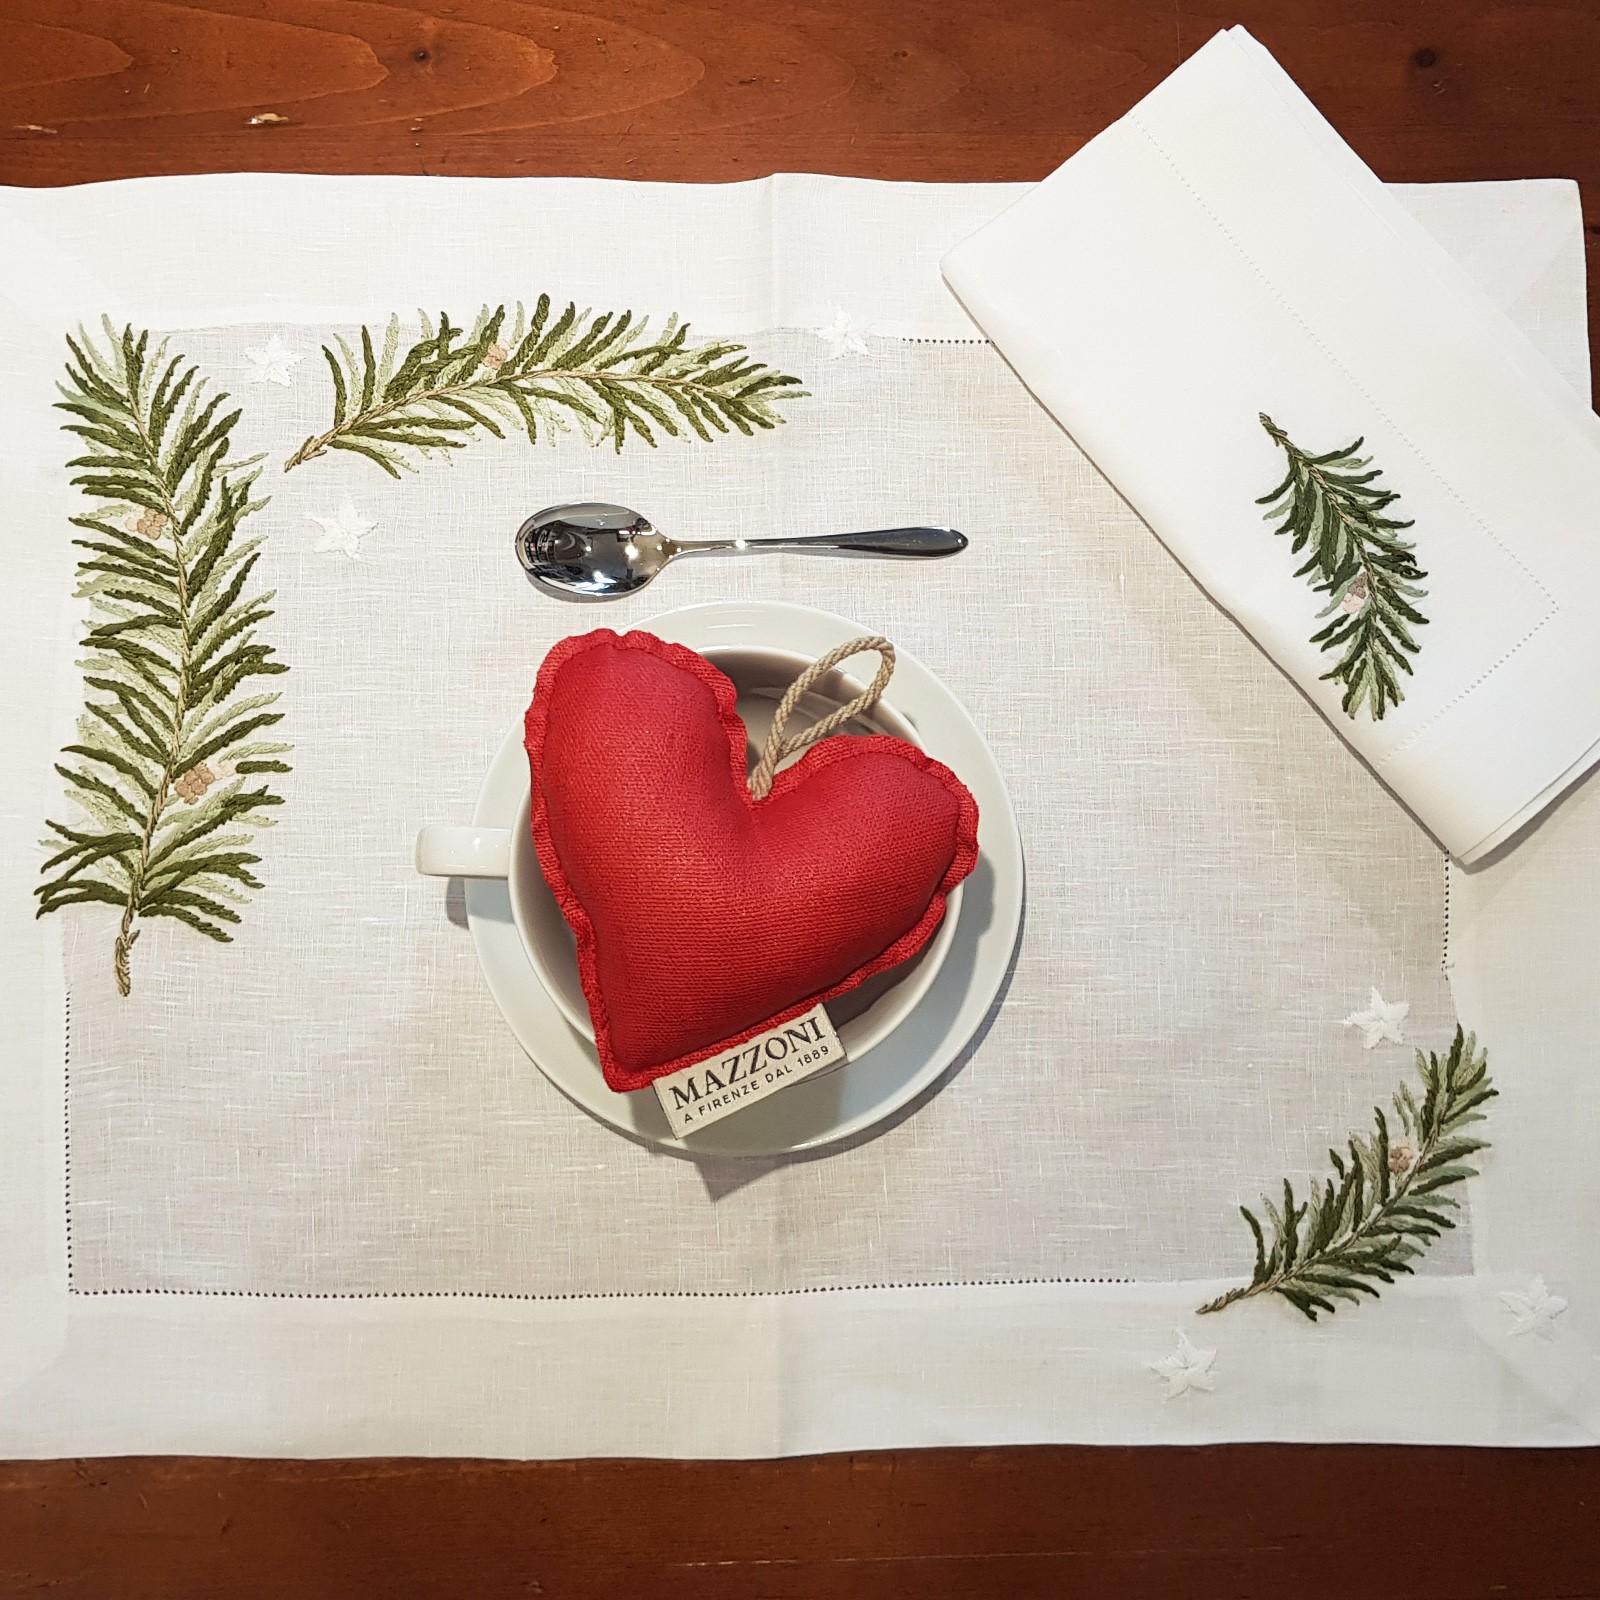 Pure Linen Hand Embroidered Place Mats And Napkins Ramo Mazzoni Casa